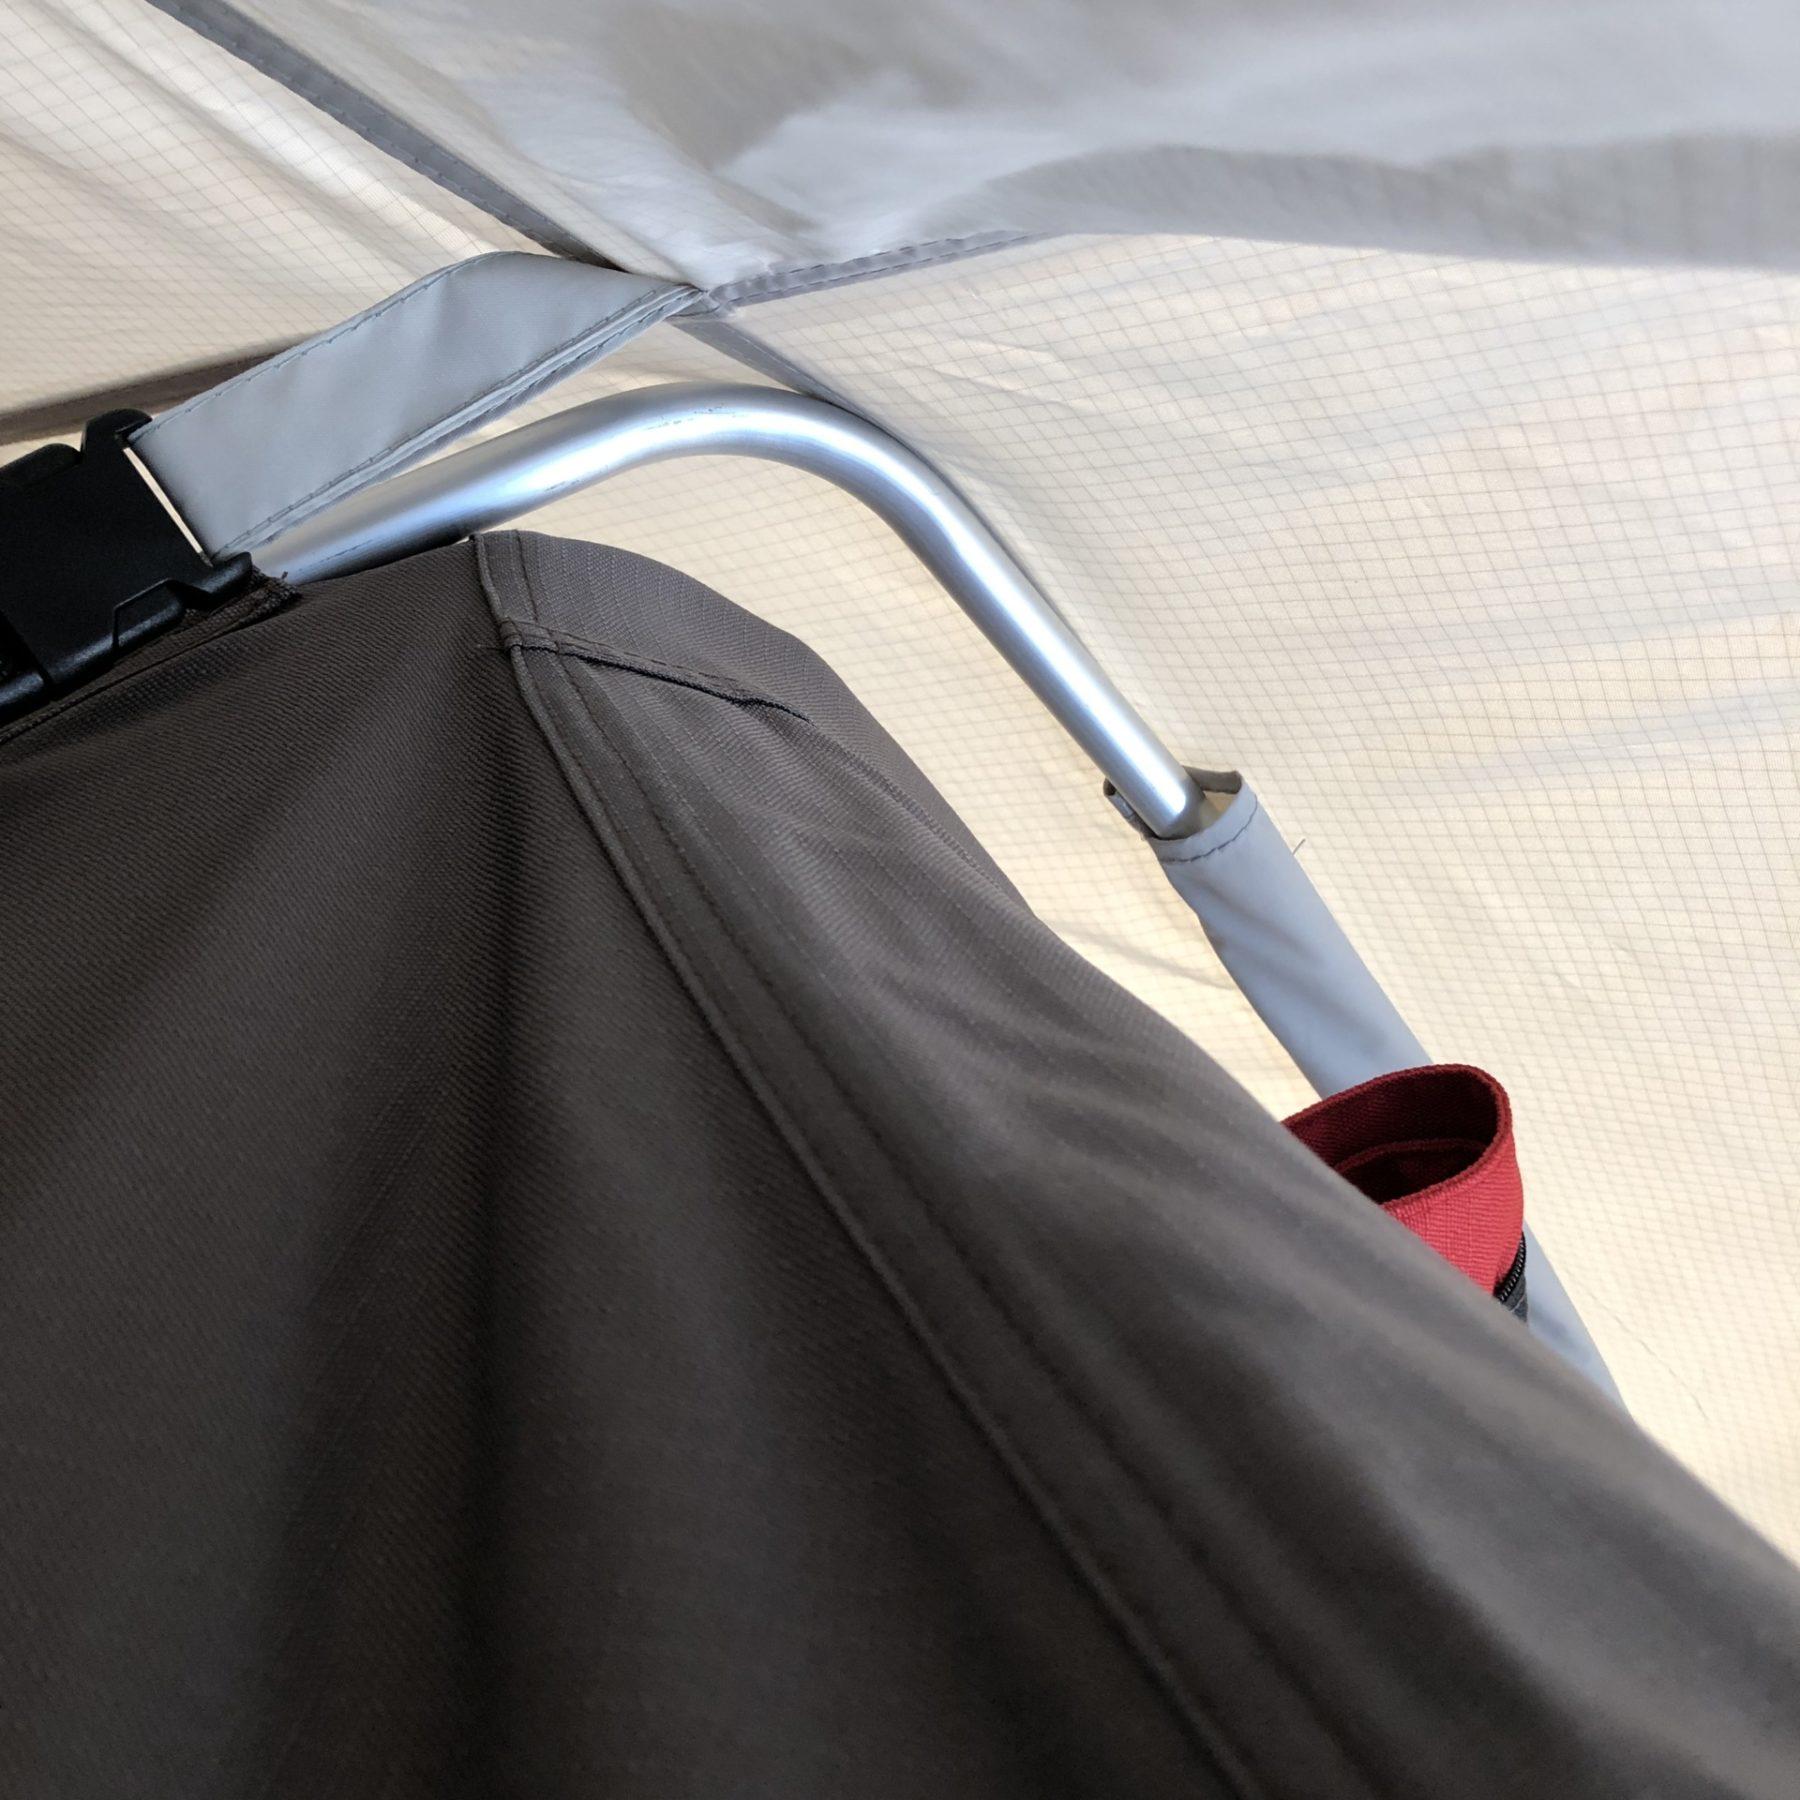 Yakima regntrekkstenger SkyRise (3x)